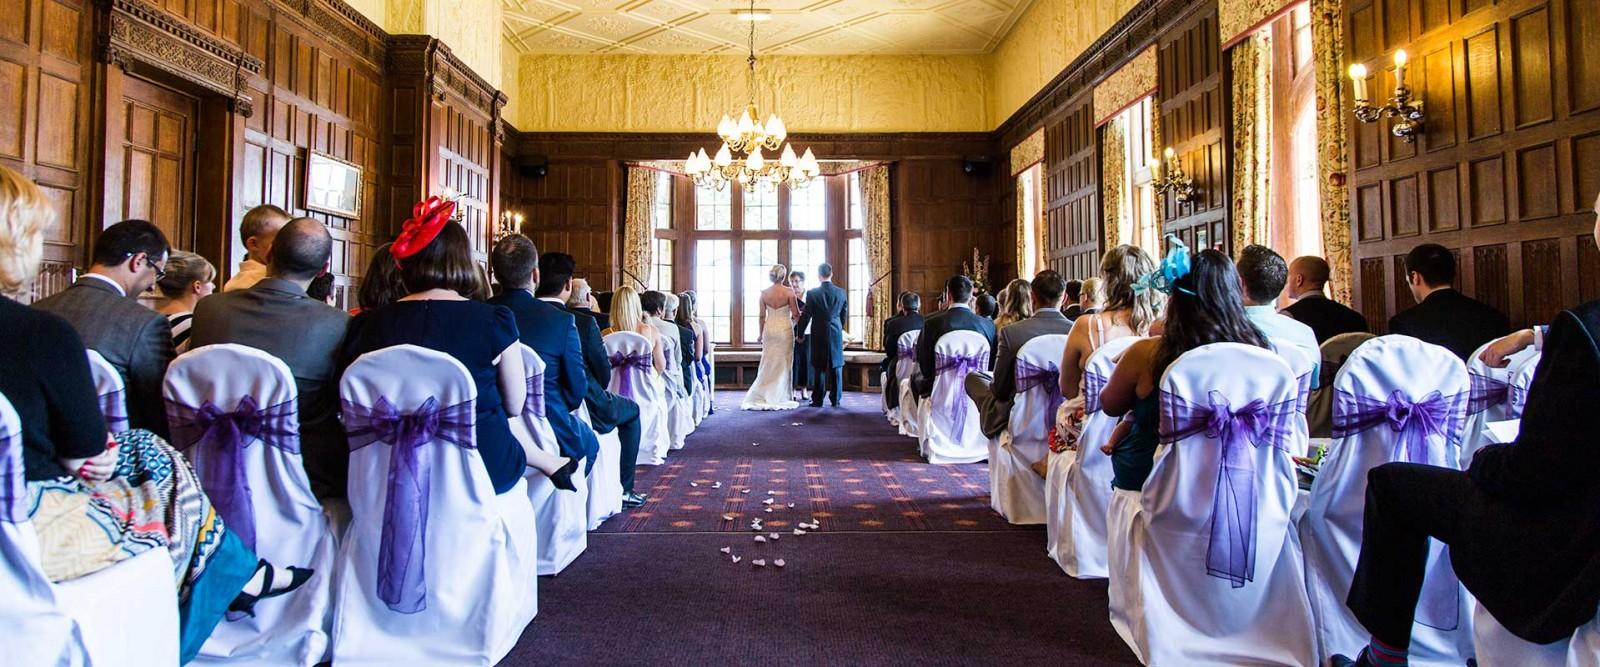 Tom & Thea Wedding Dumbleton Hall Banner